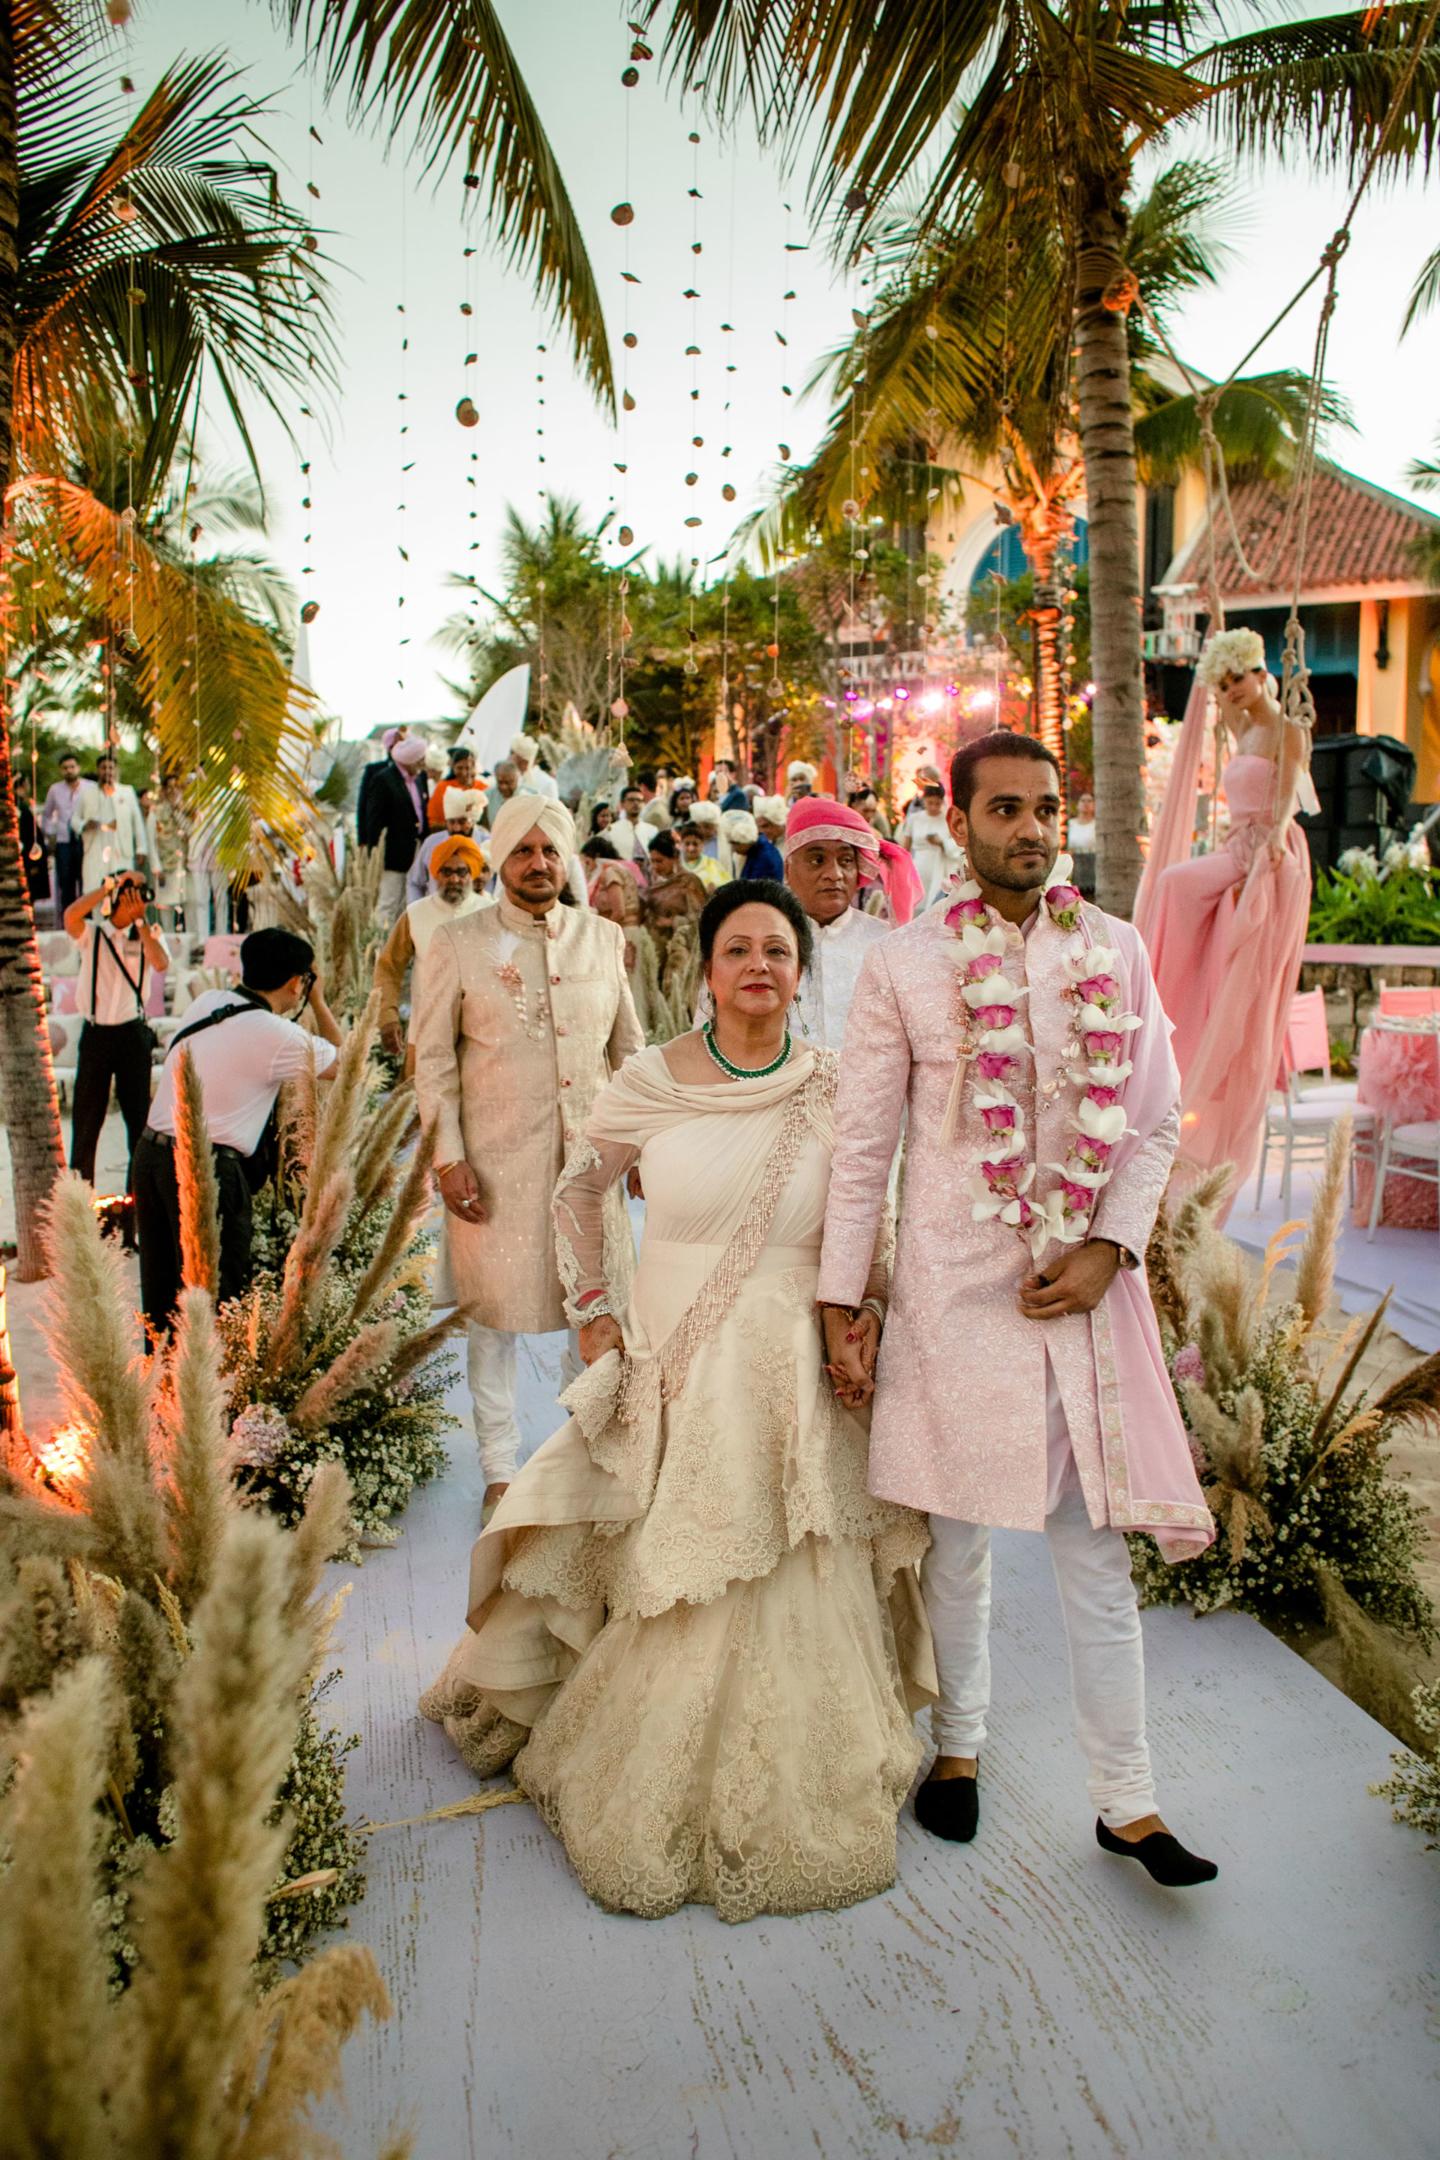 - 124 :: What an adventure: an Indian wedding in Vietnam :: Luxury wedding photography - 123 ::  - 124